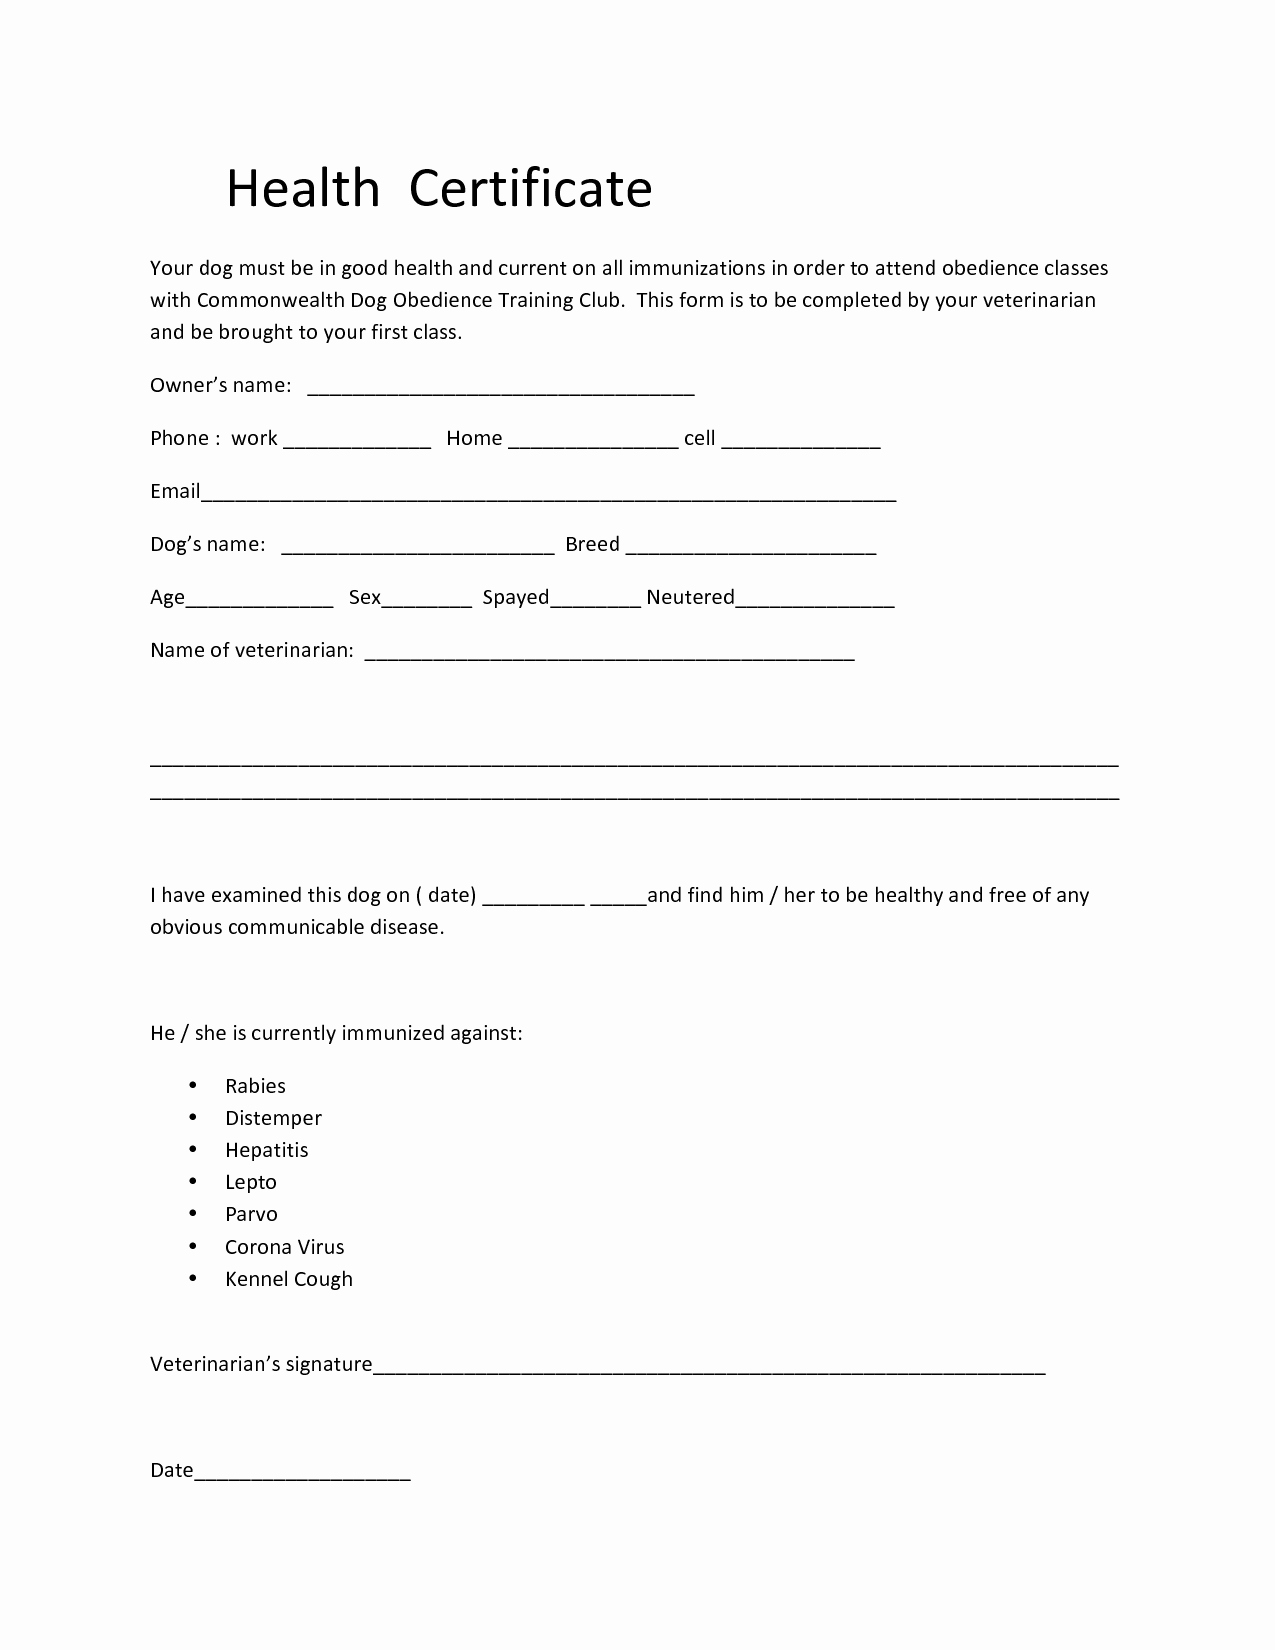 Pet Health Certificate Template New Dog Health Certificate form Related Keywords Dog Health